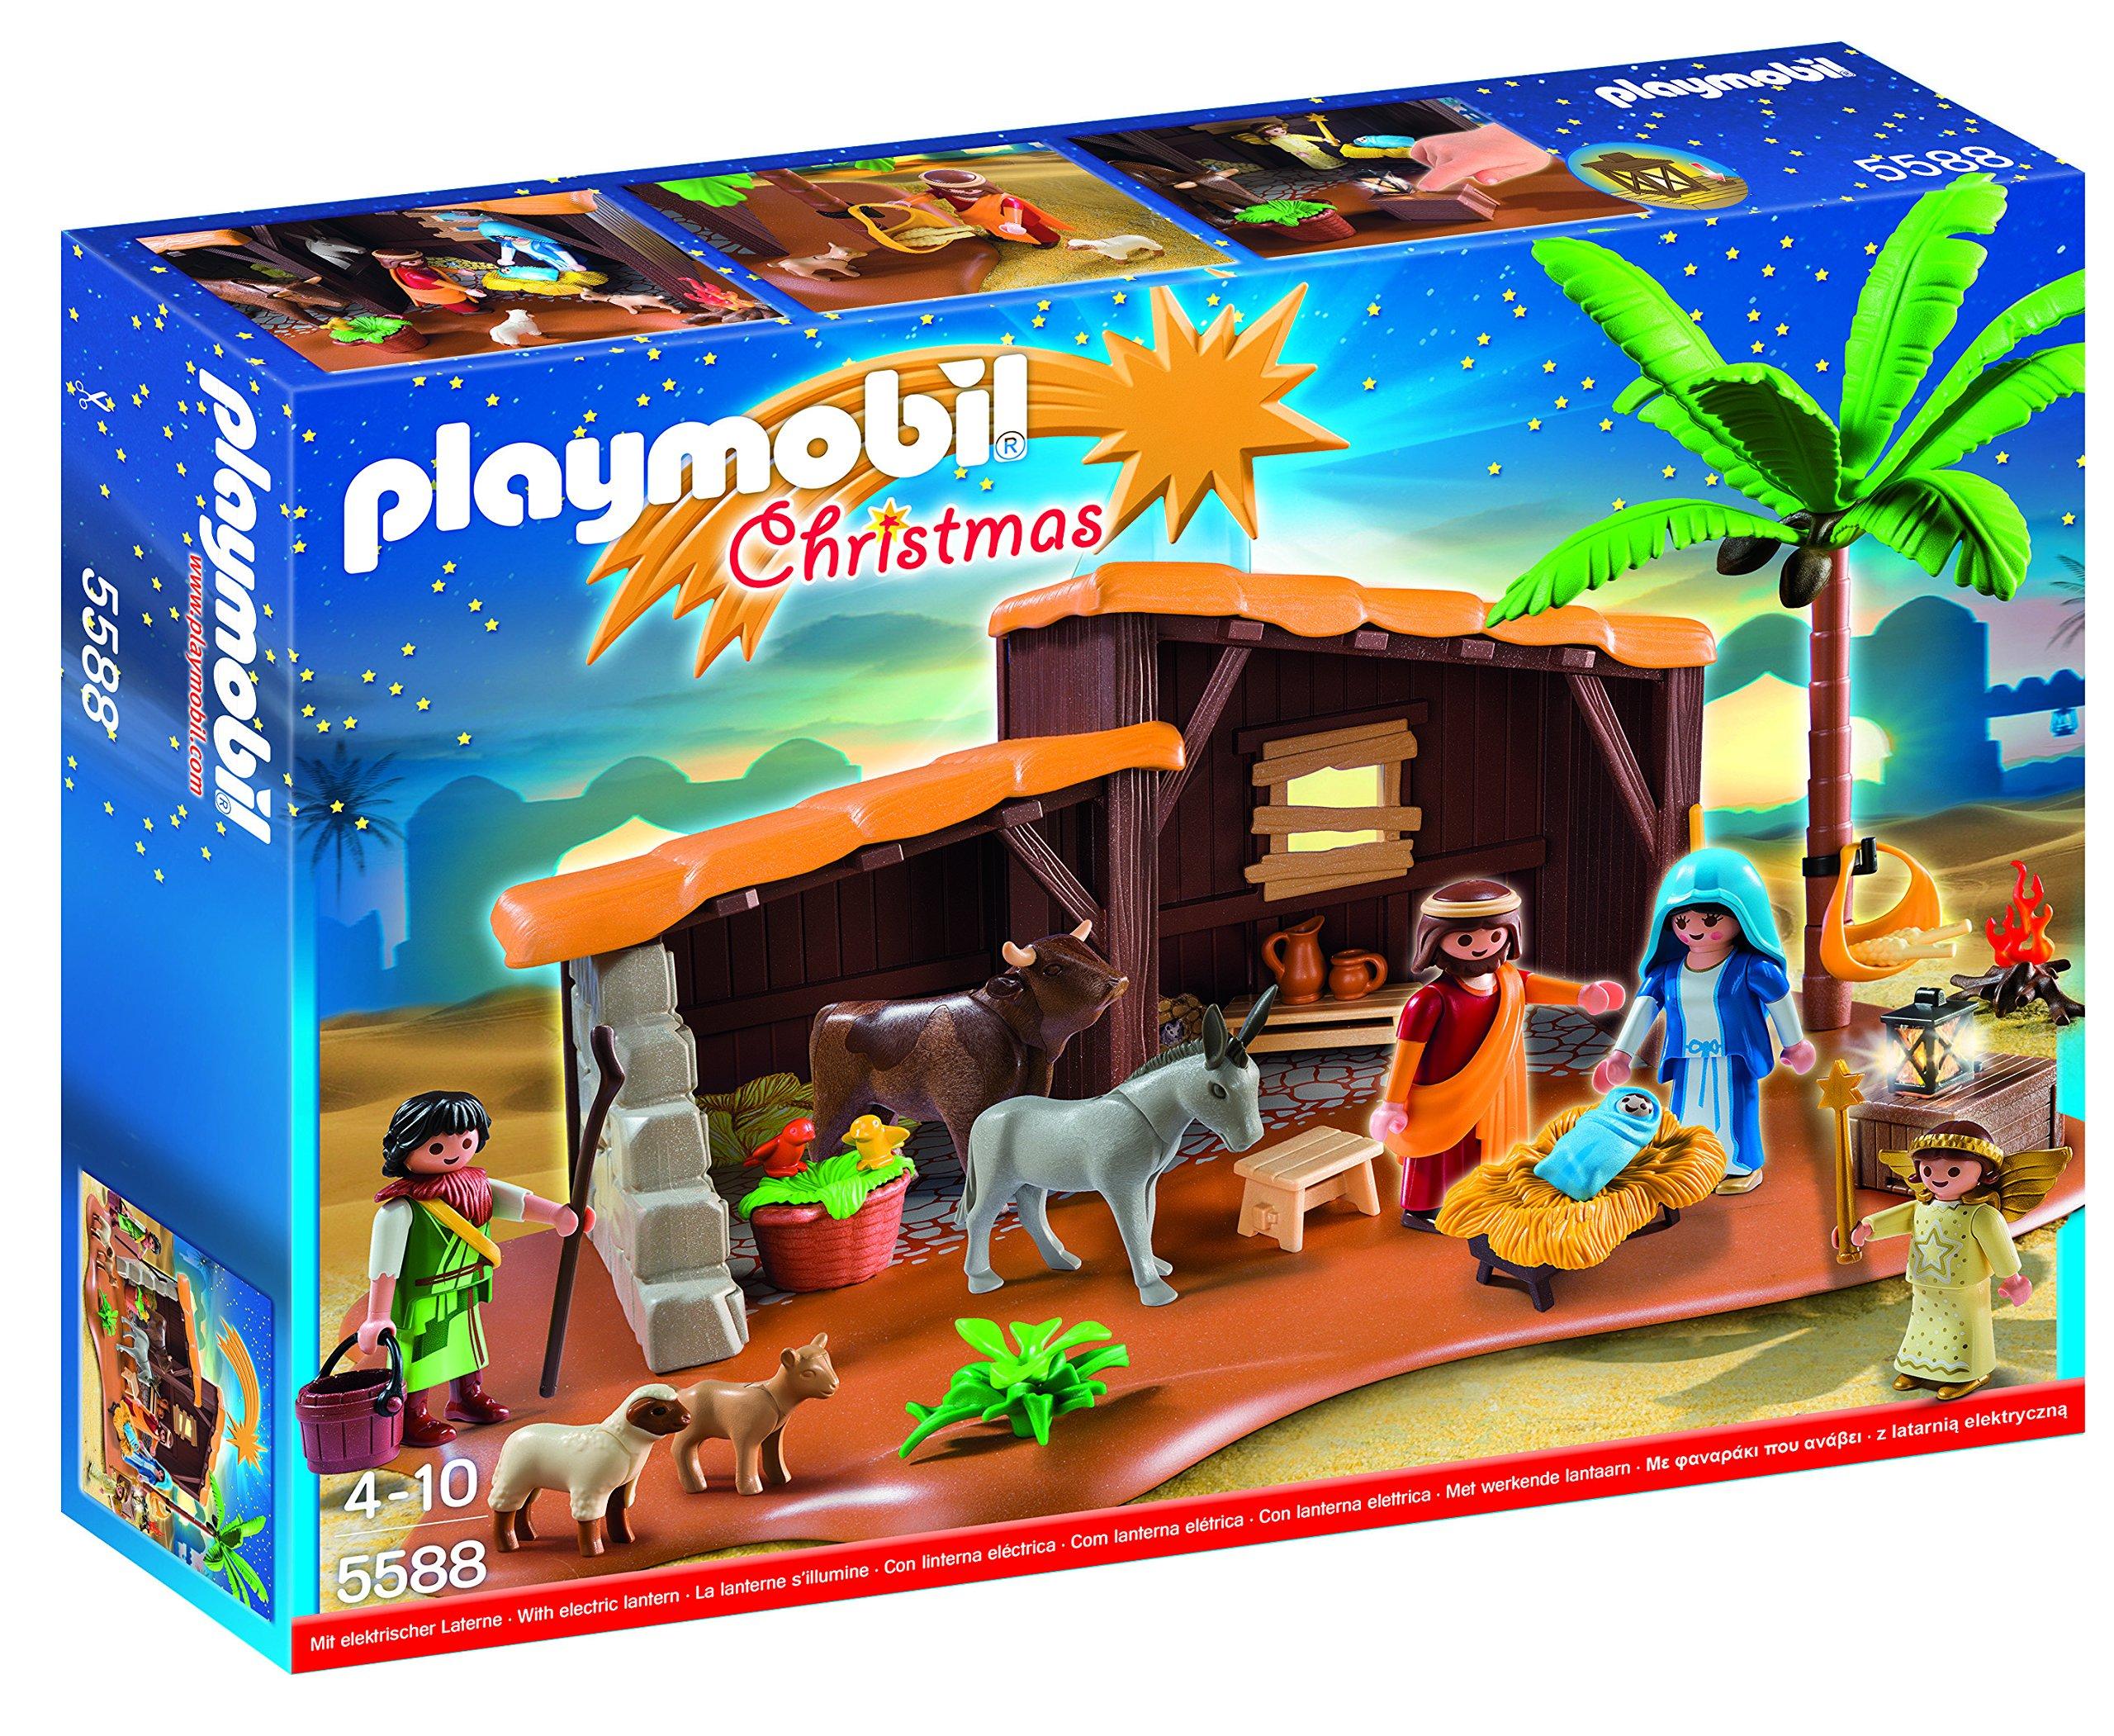 Playmobil Playmobil-5588 Navidad-Playset Bel&eacuten,, 39.9 x 29.7 x 7.4 (5588